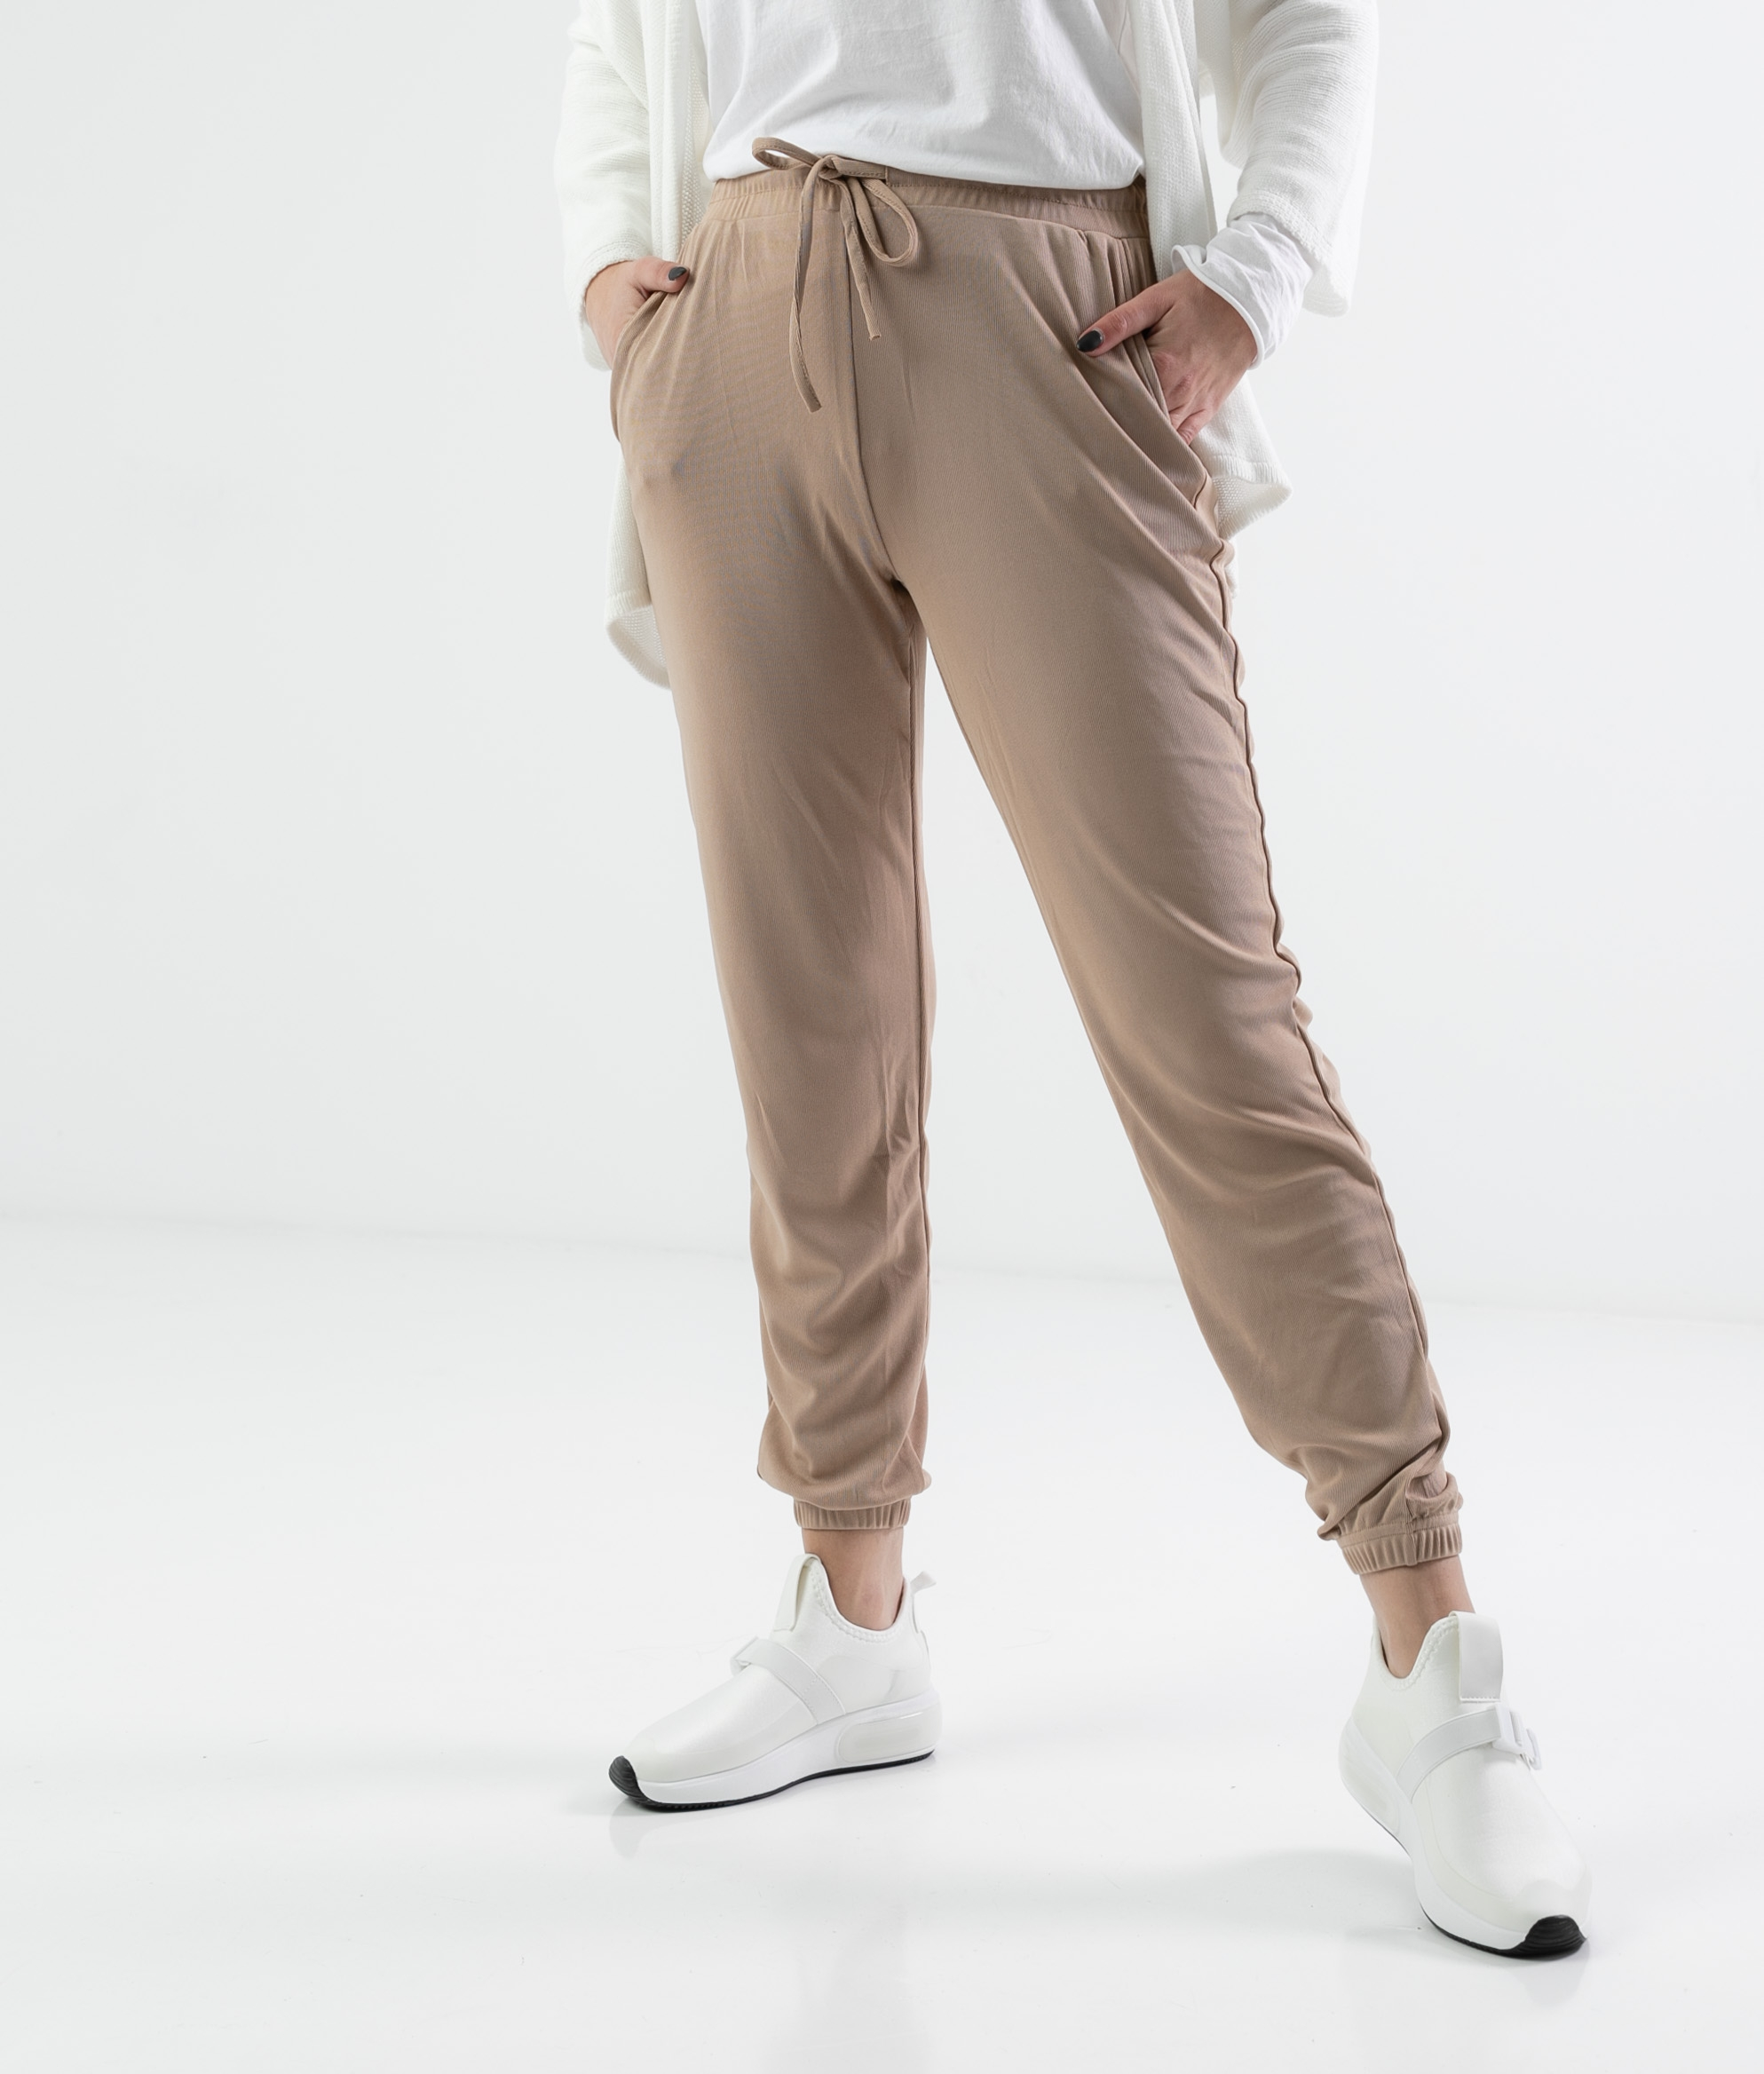 Pantalón Emere - Camel